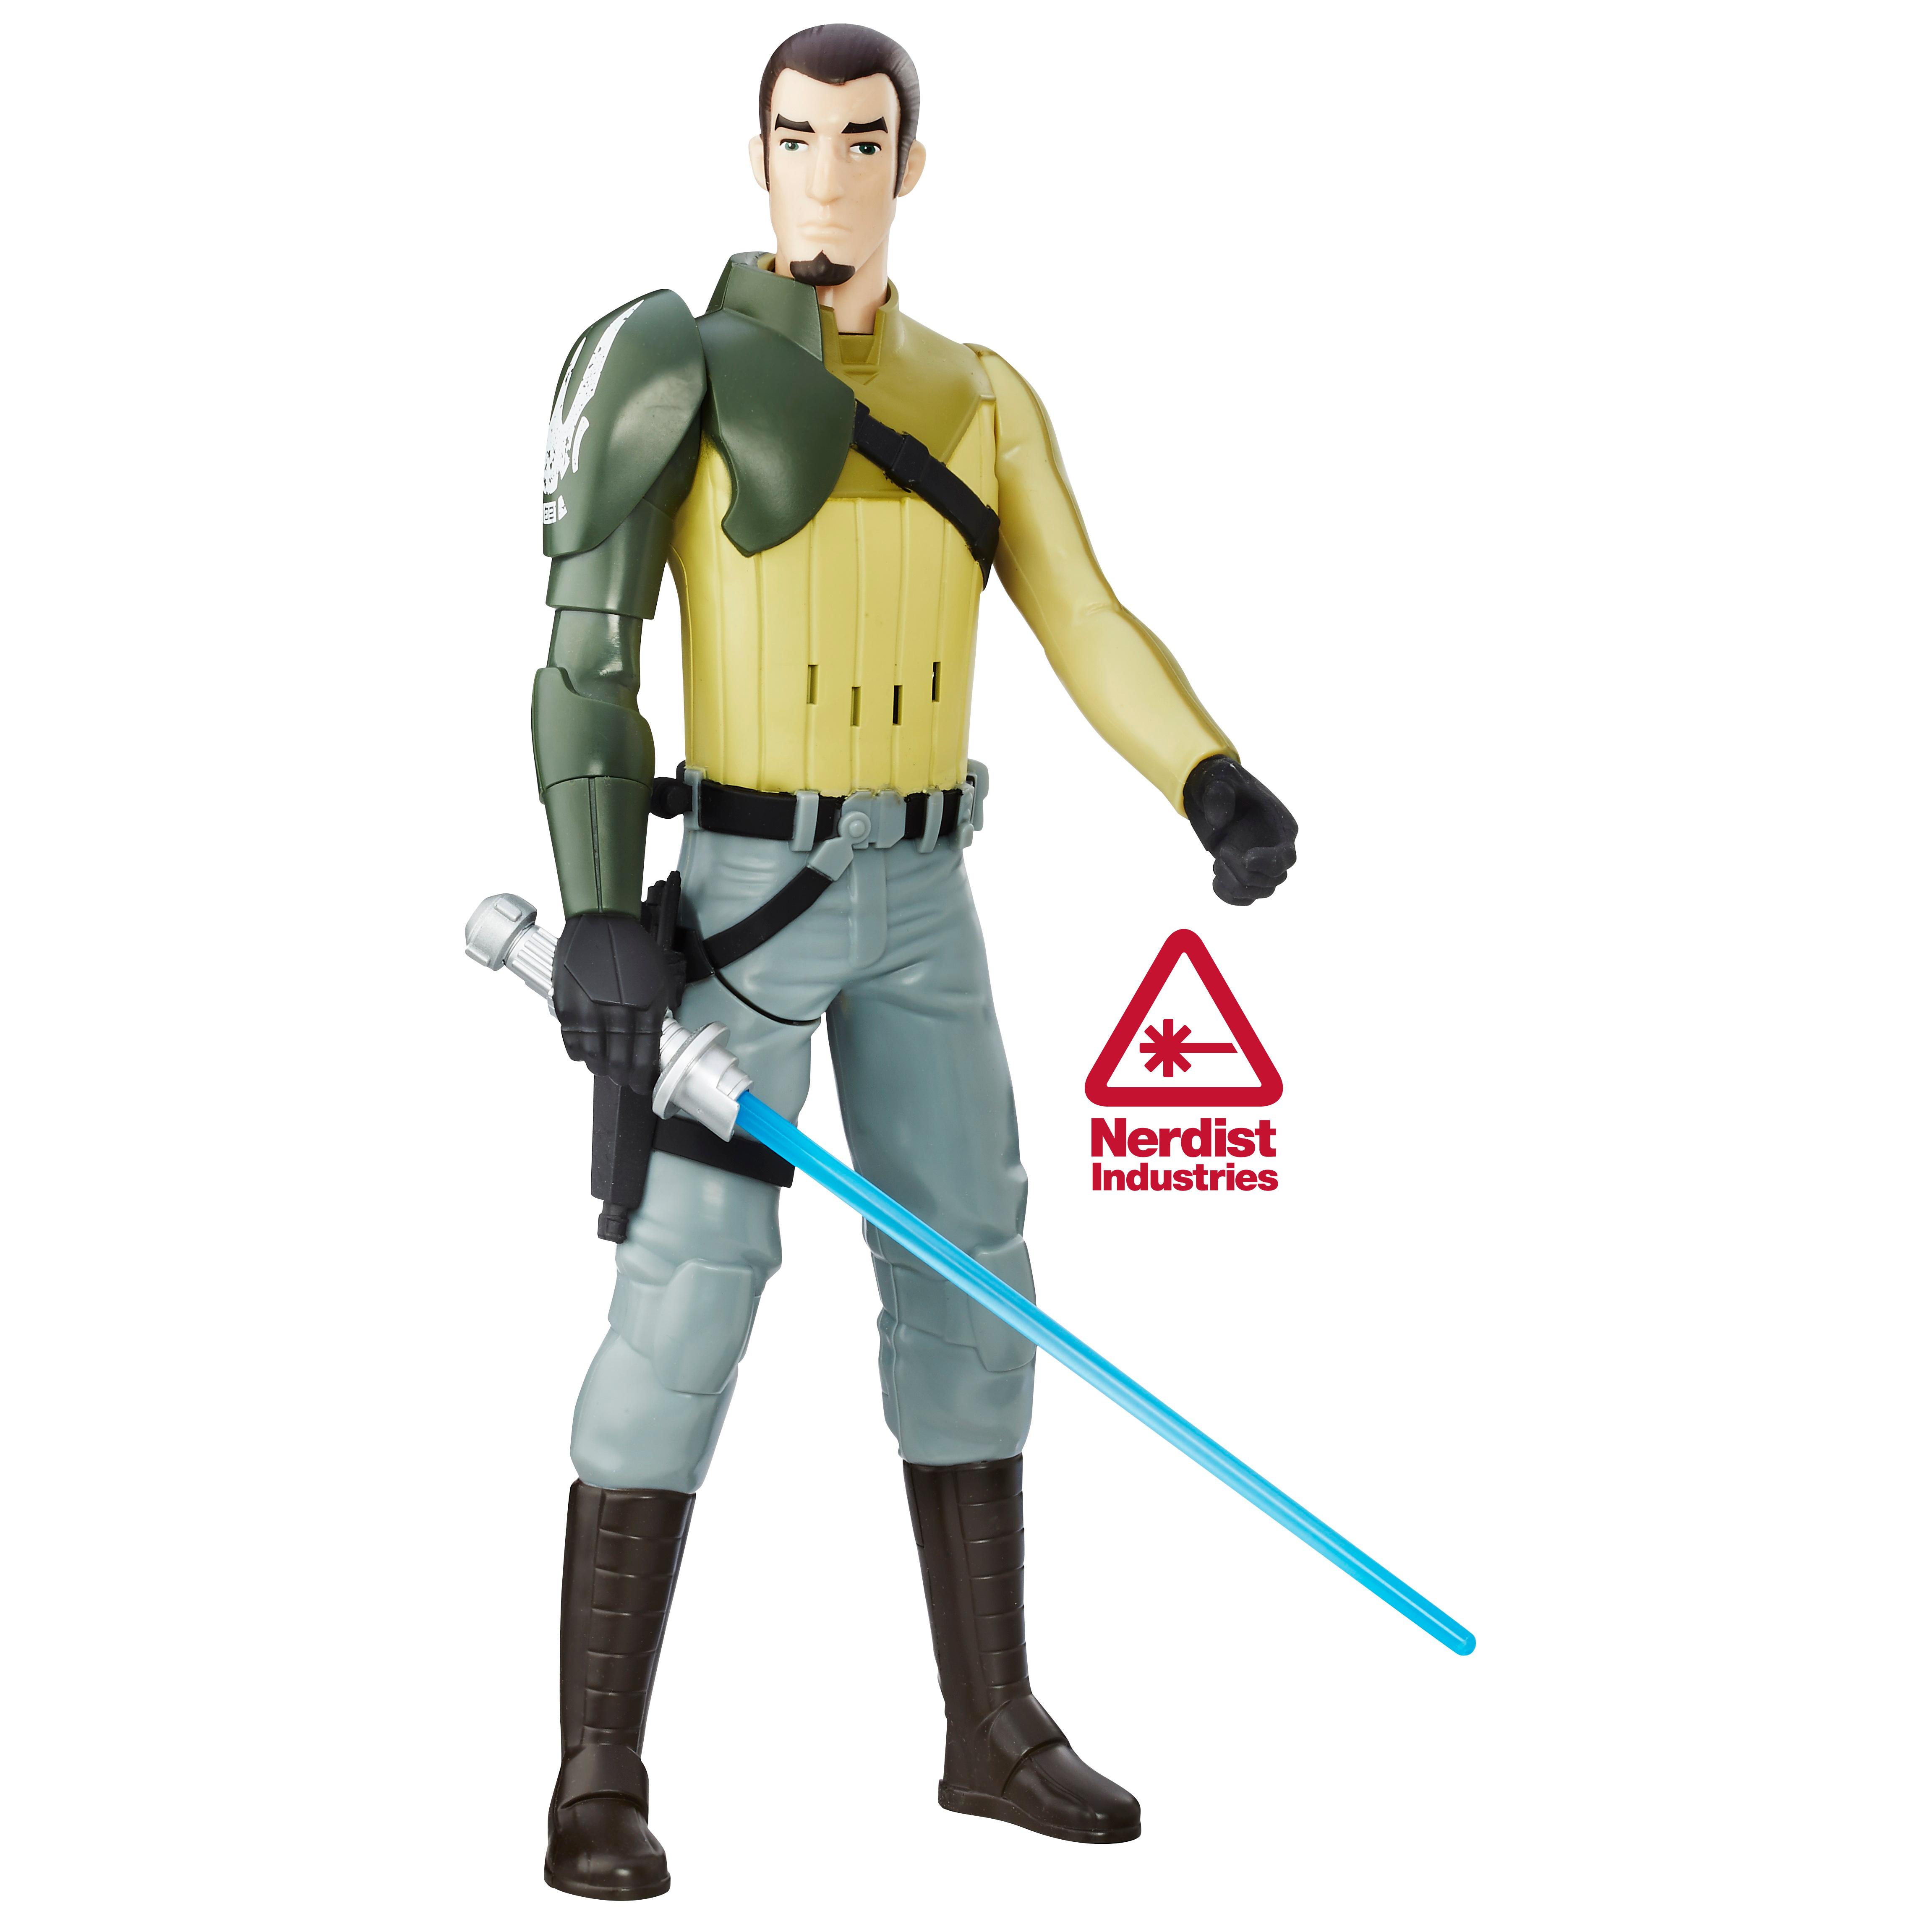 Hasbro-Star-Wars-SDCC-4-07072016